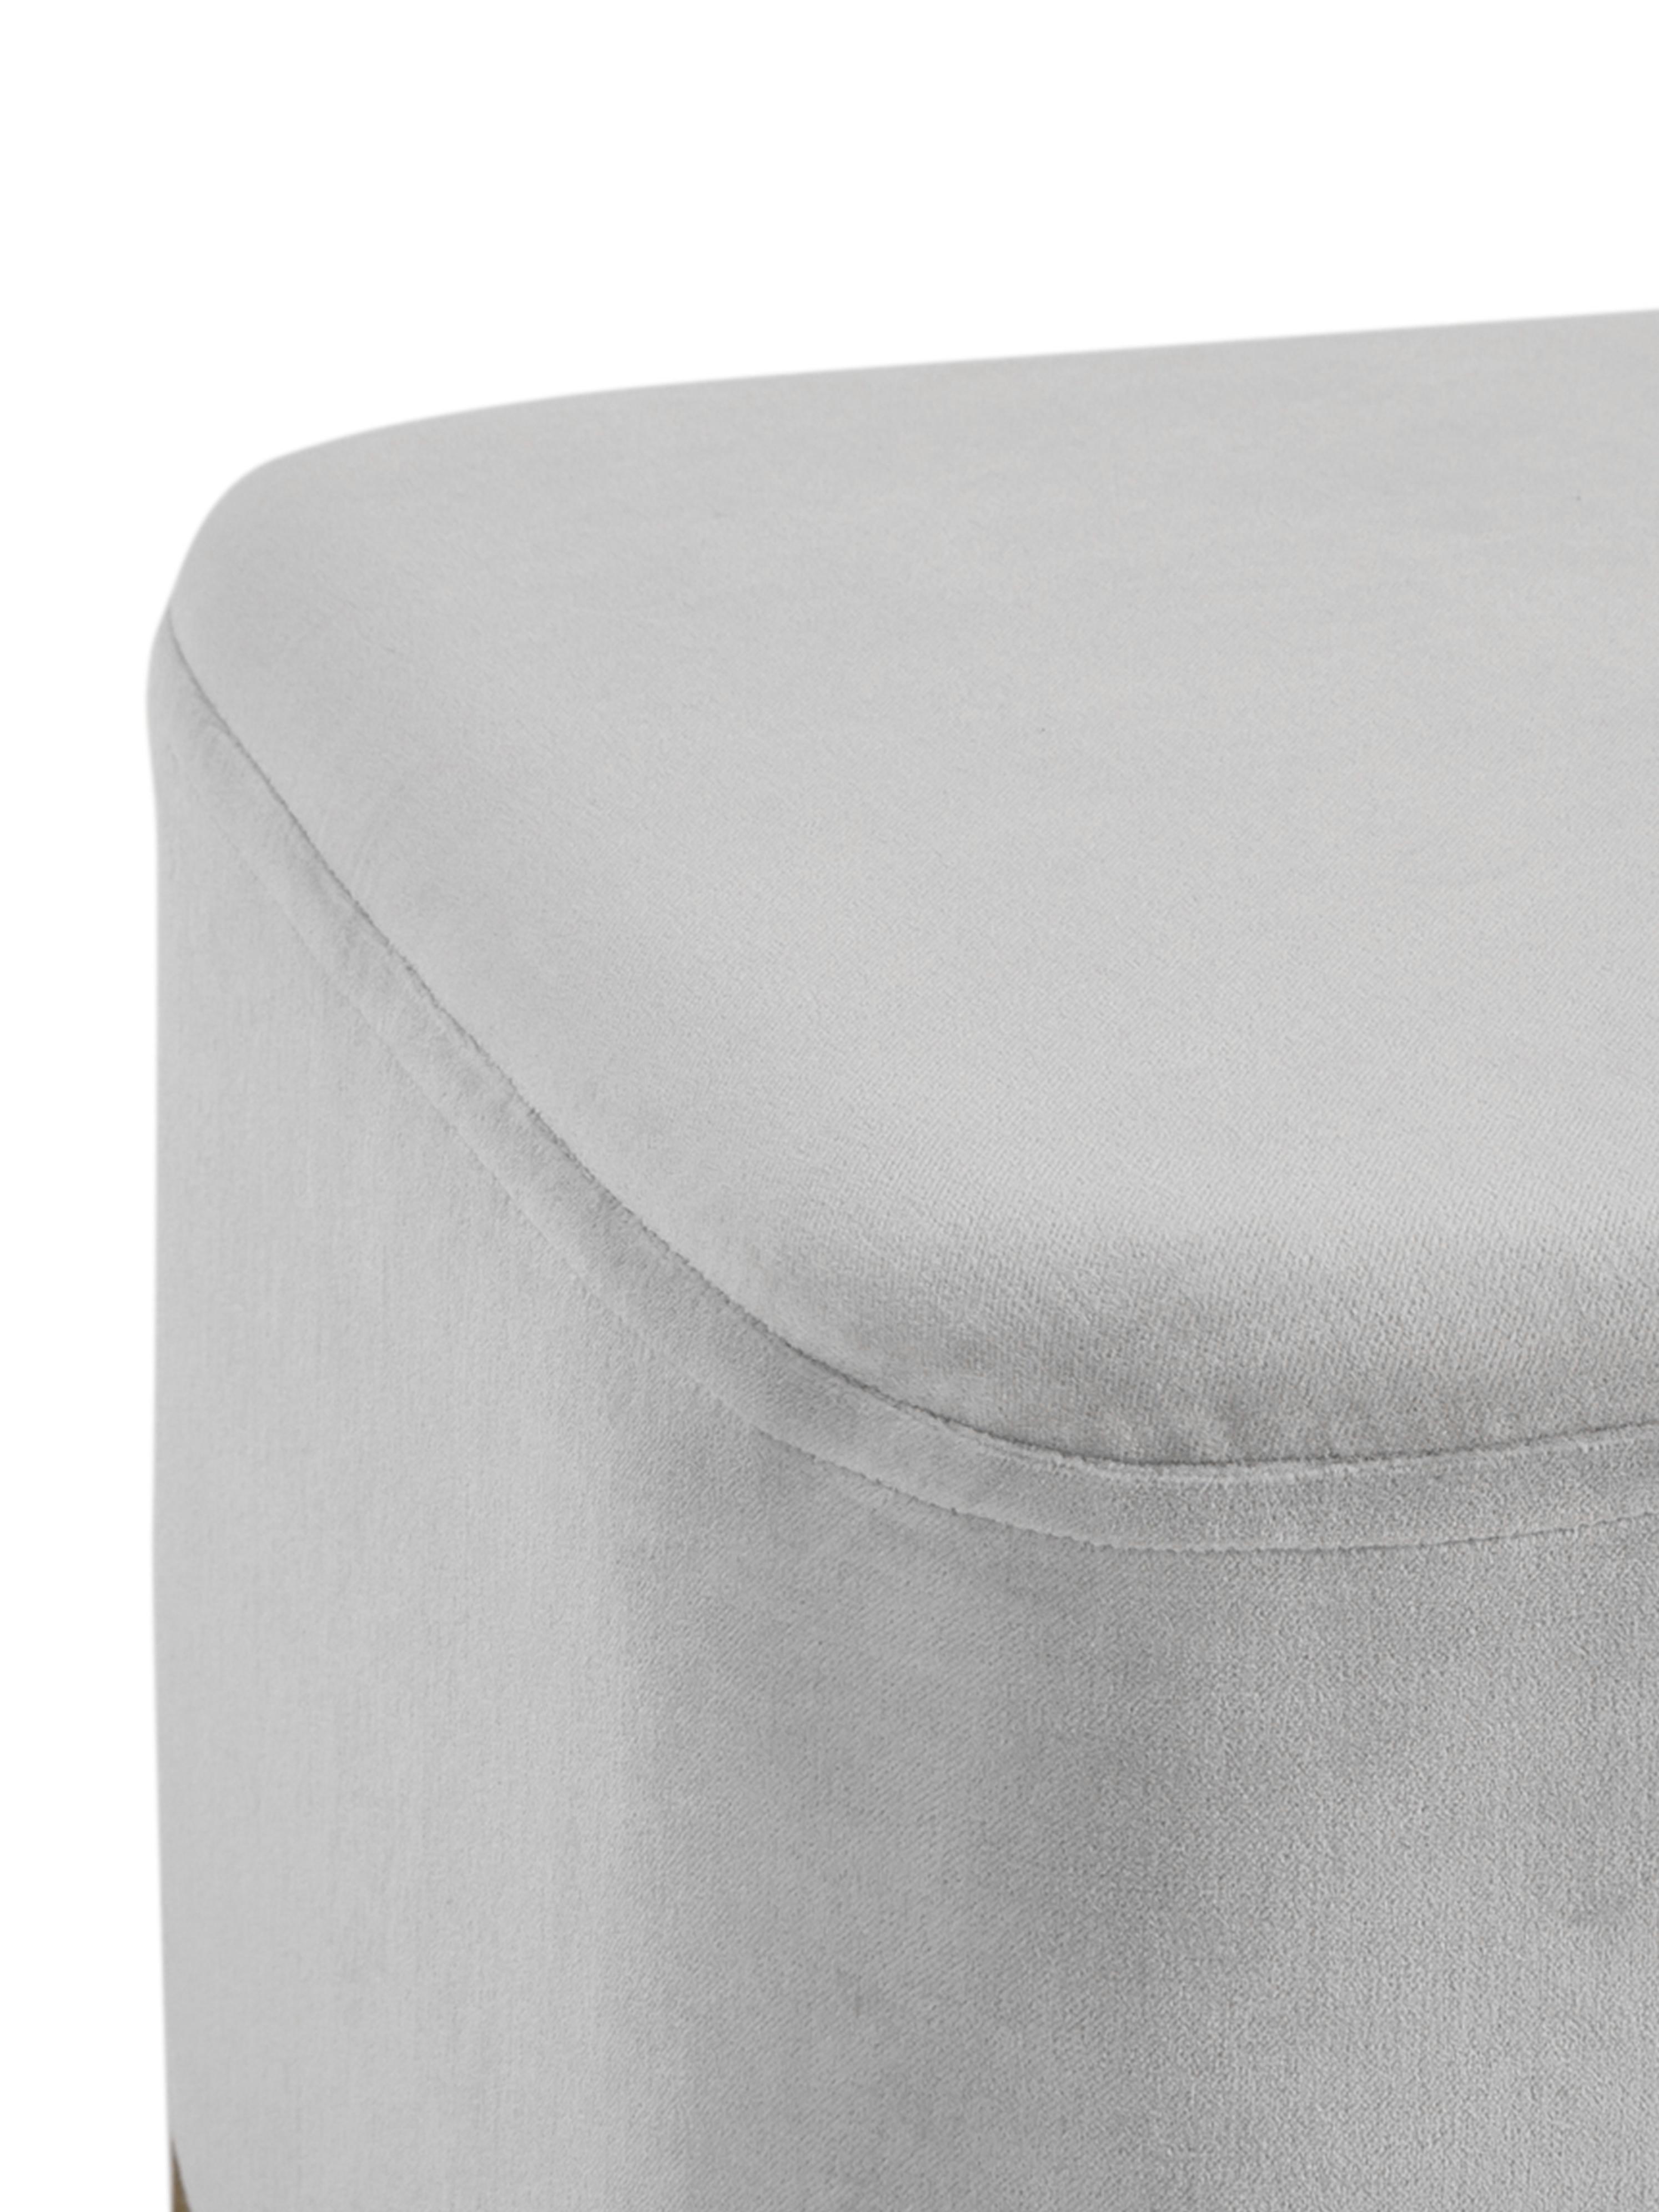 Panca imbottita in velluto Harper, Rivestimento: velluto, Grigio chiaro, dorato, Larg. 90 x Alt. 44 cm